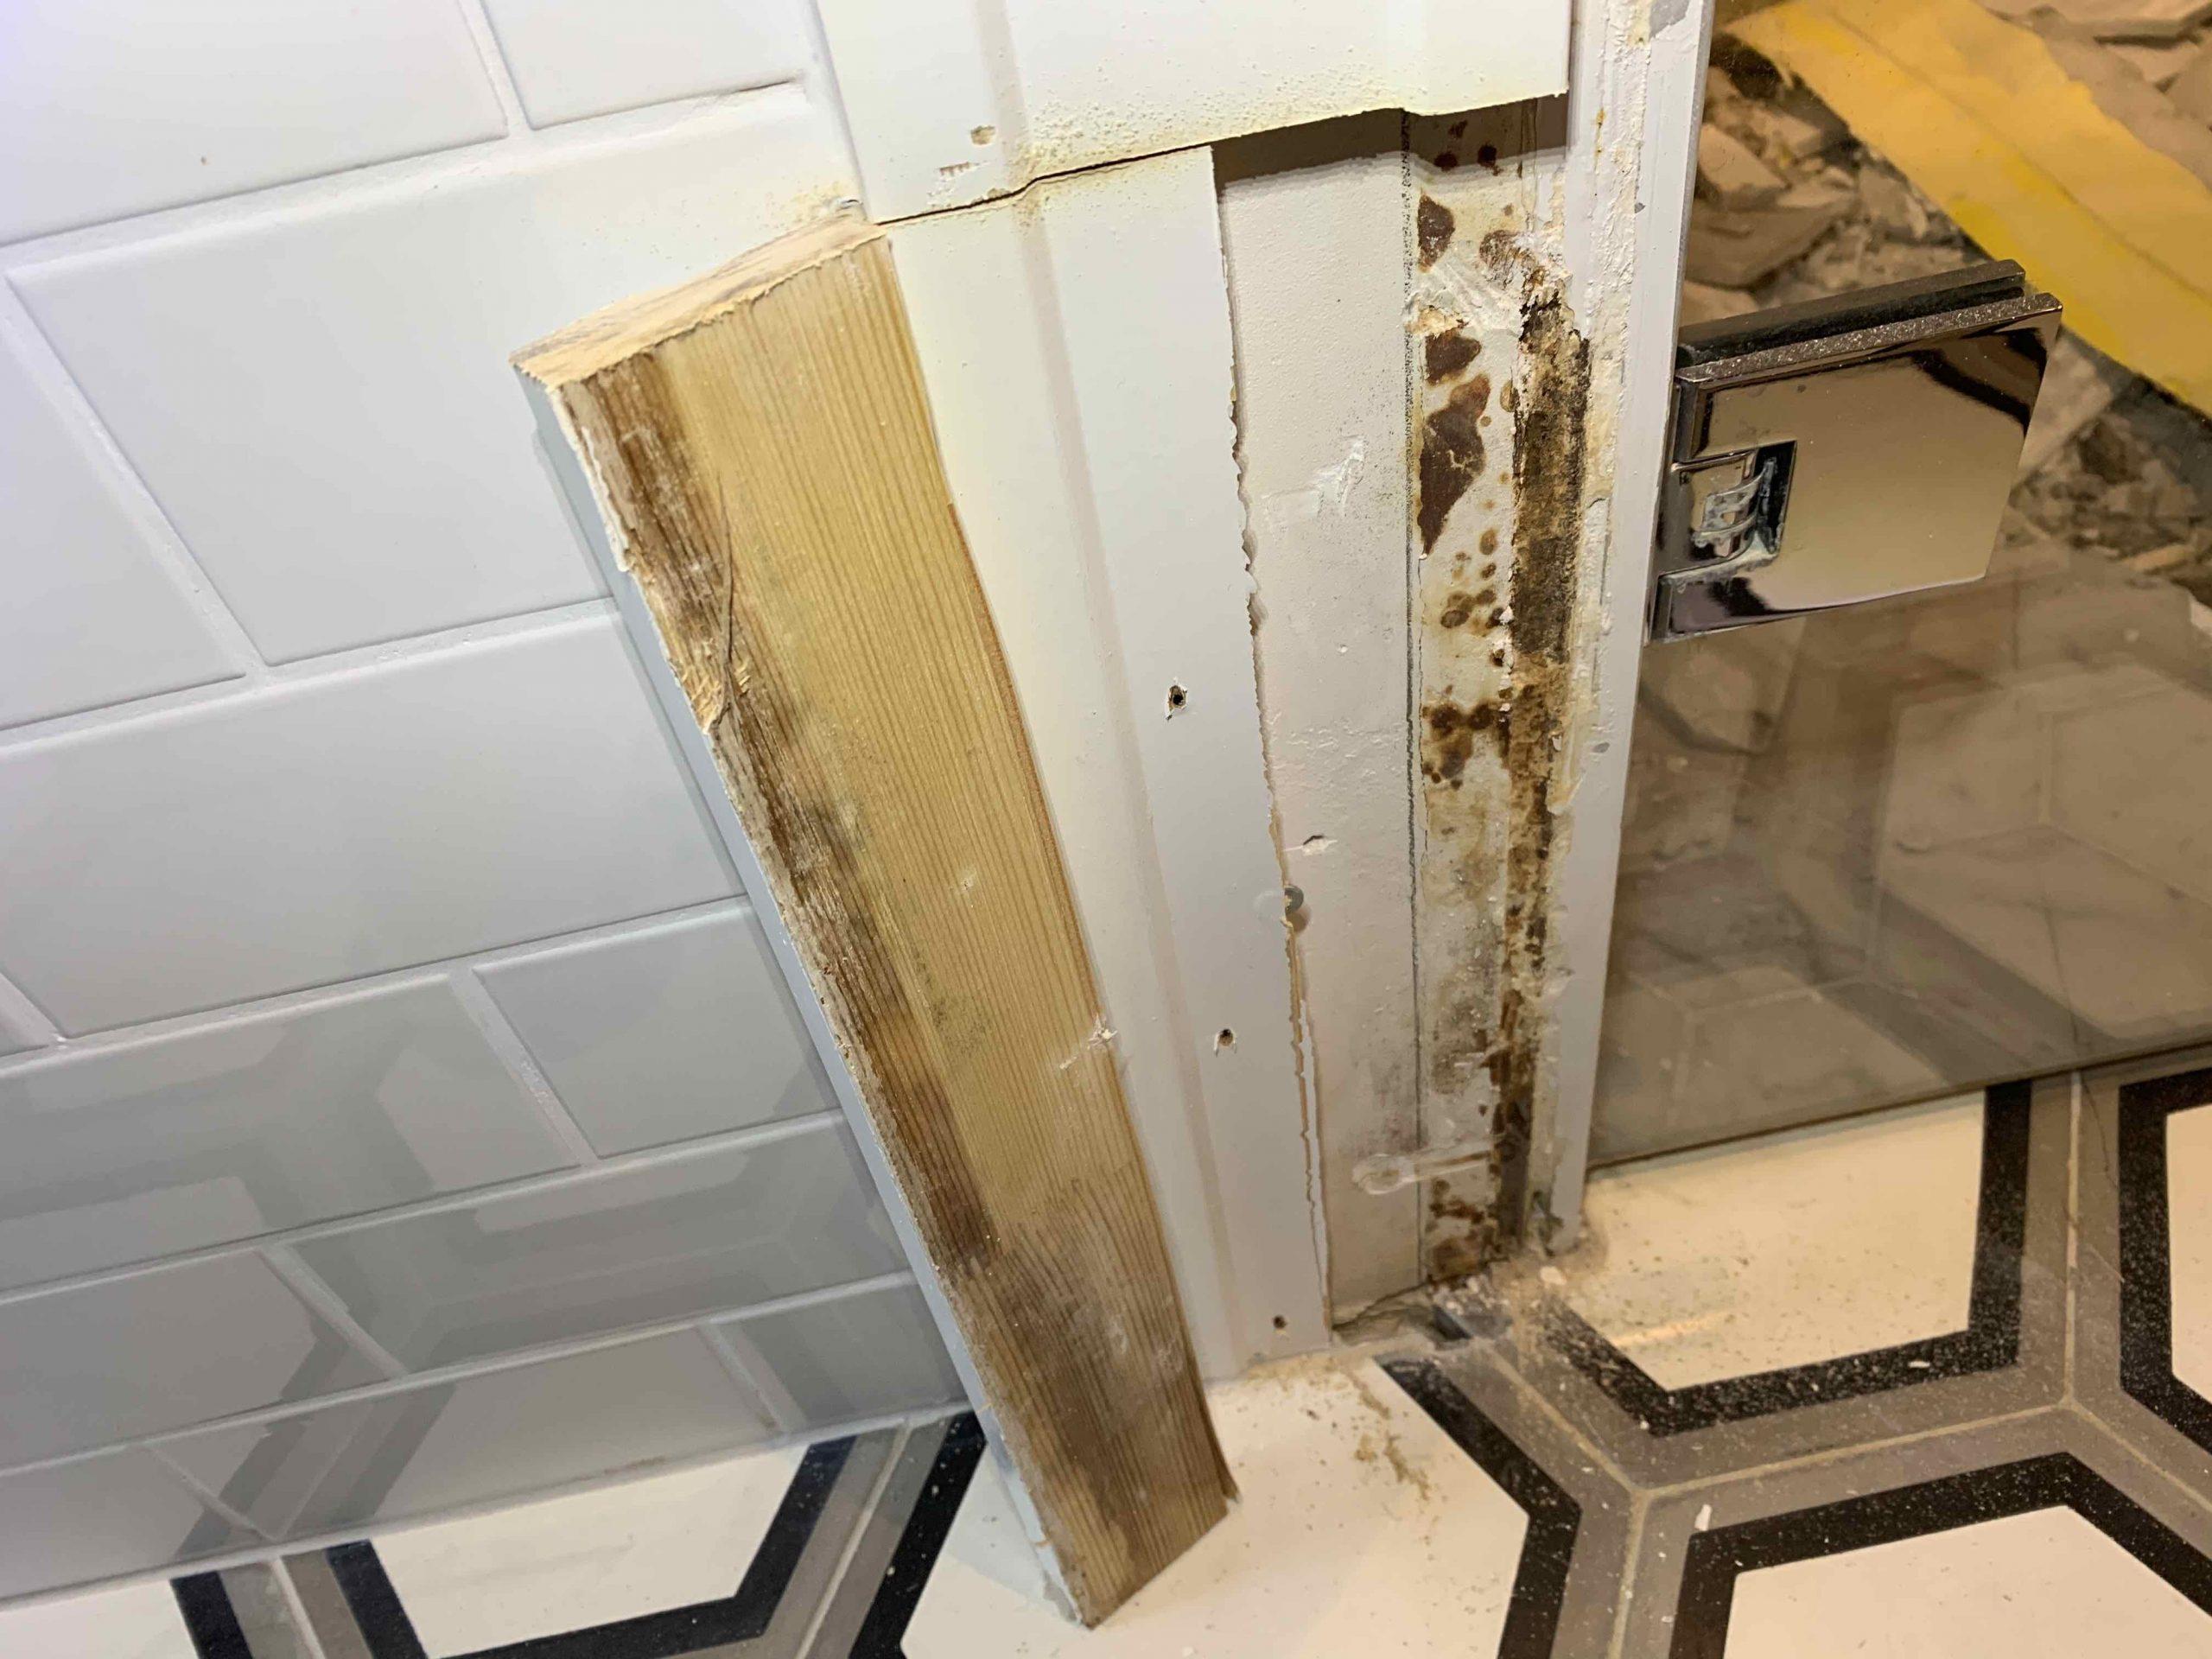 Vattenskada i badrum